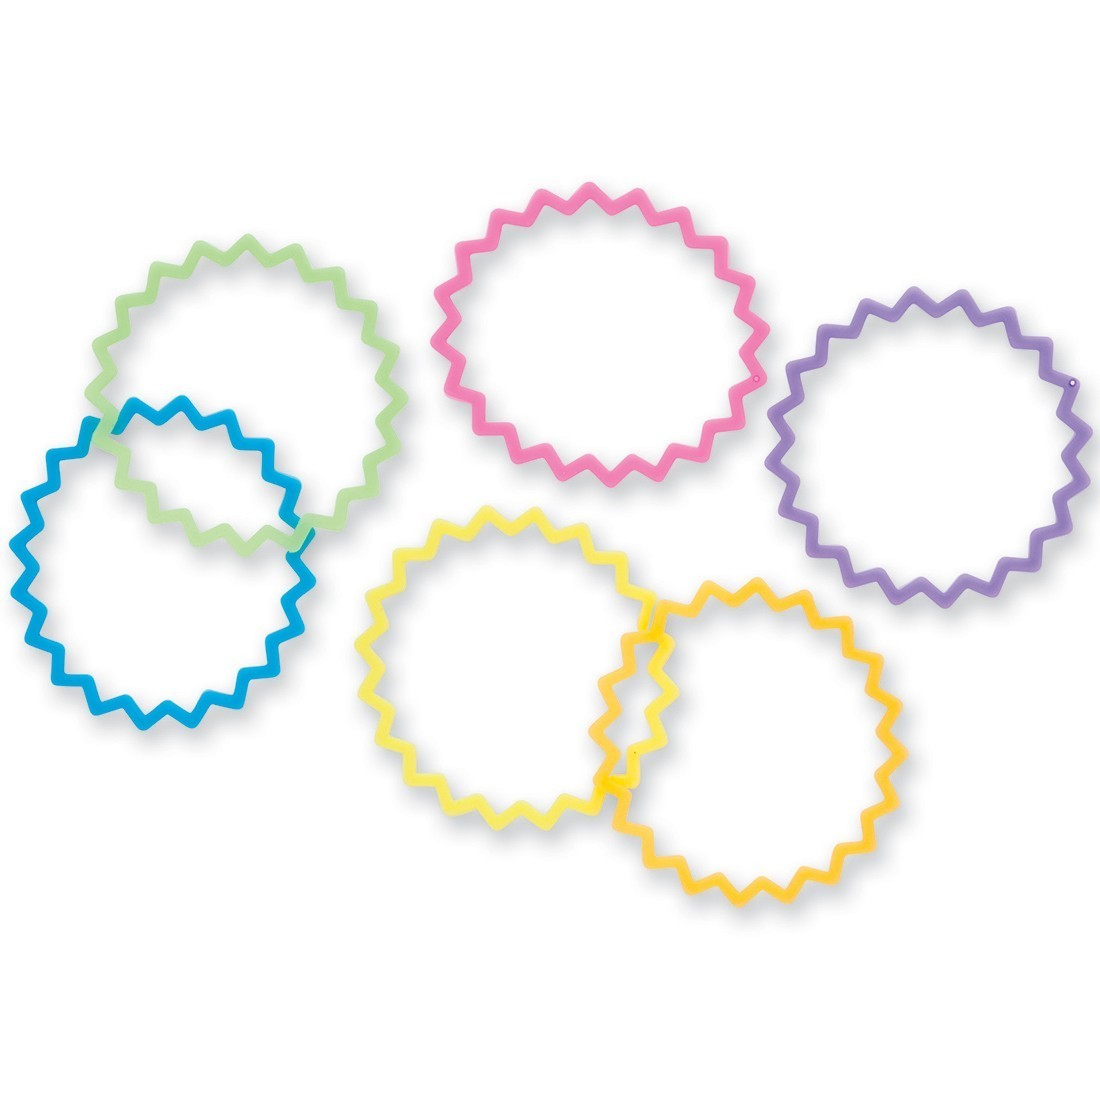 Neon Wave Bracelets [image]